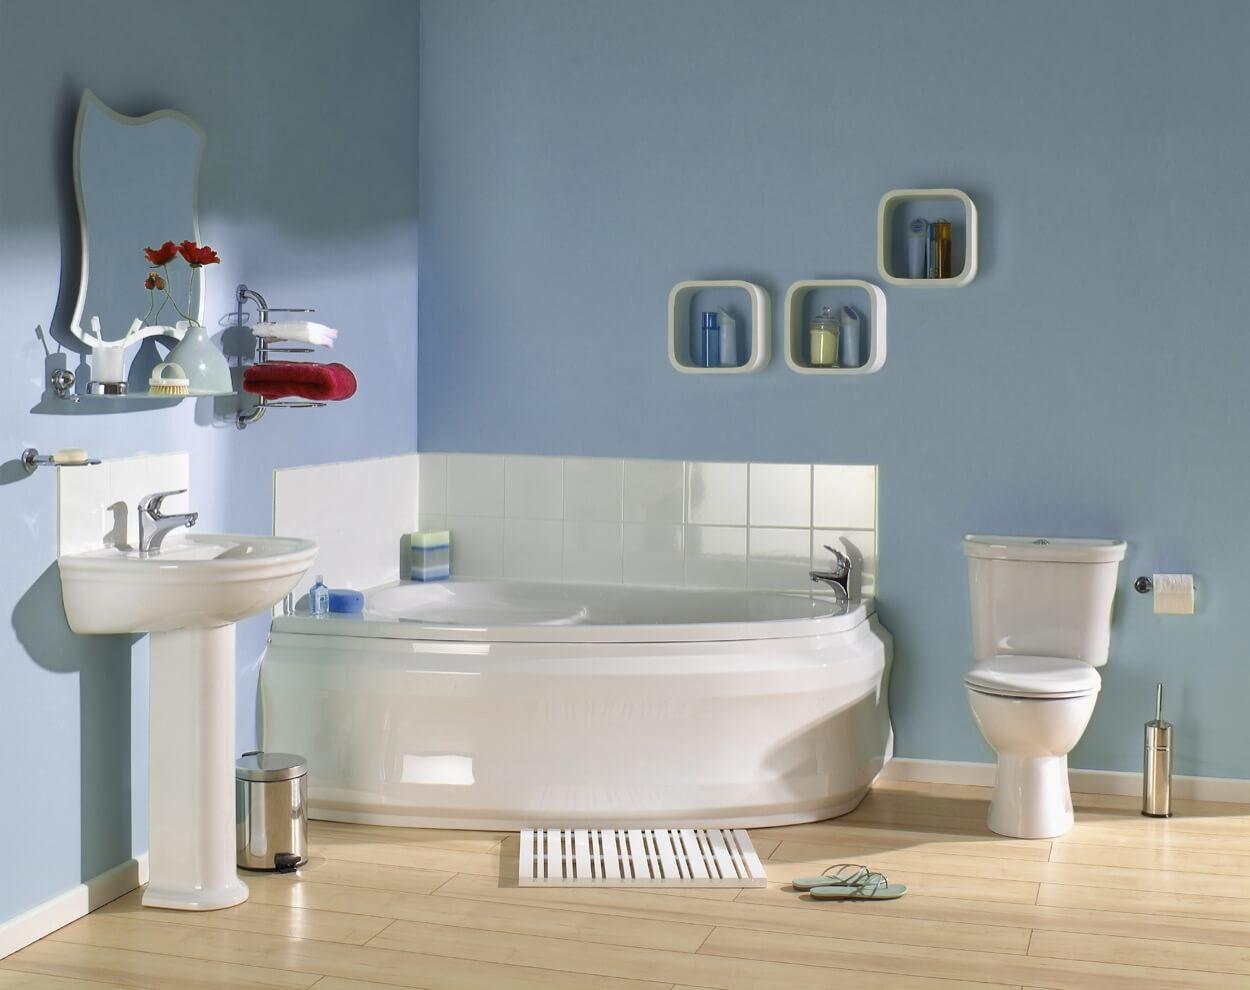 Corner Soaking Tub With White Tiled Splash Guard TheBathOutletcom - Splash guard for bathroom sink for bathroom decor ideas